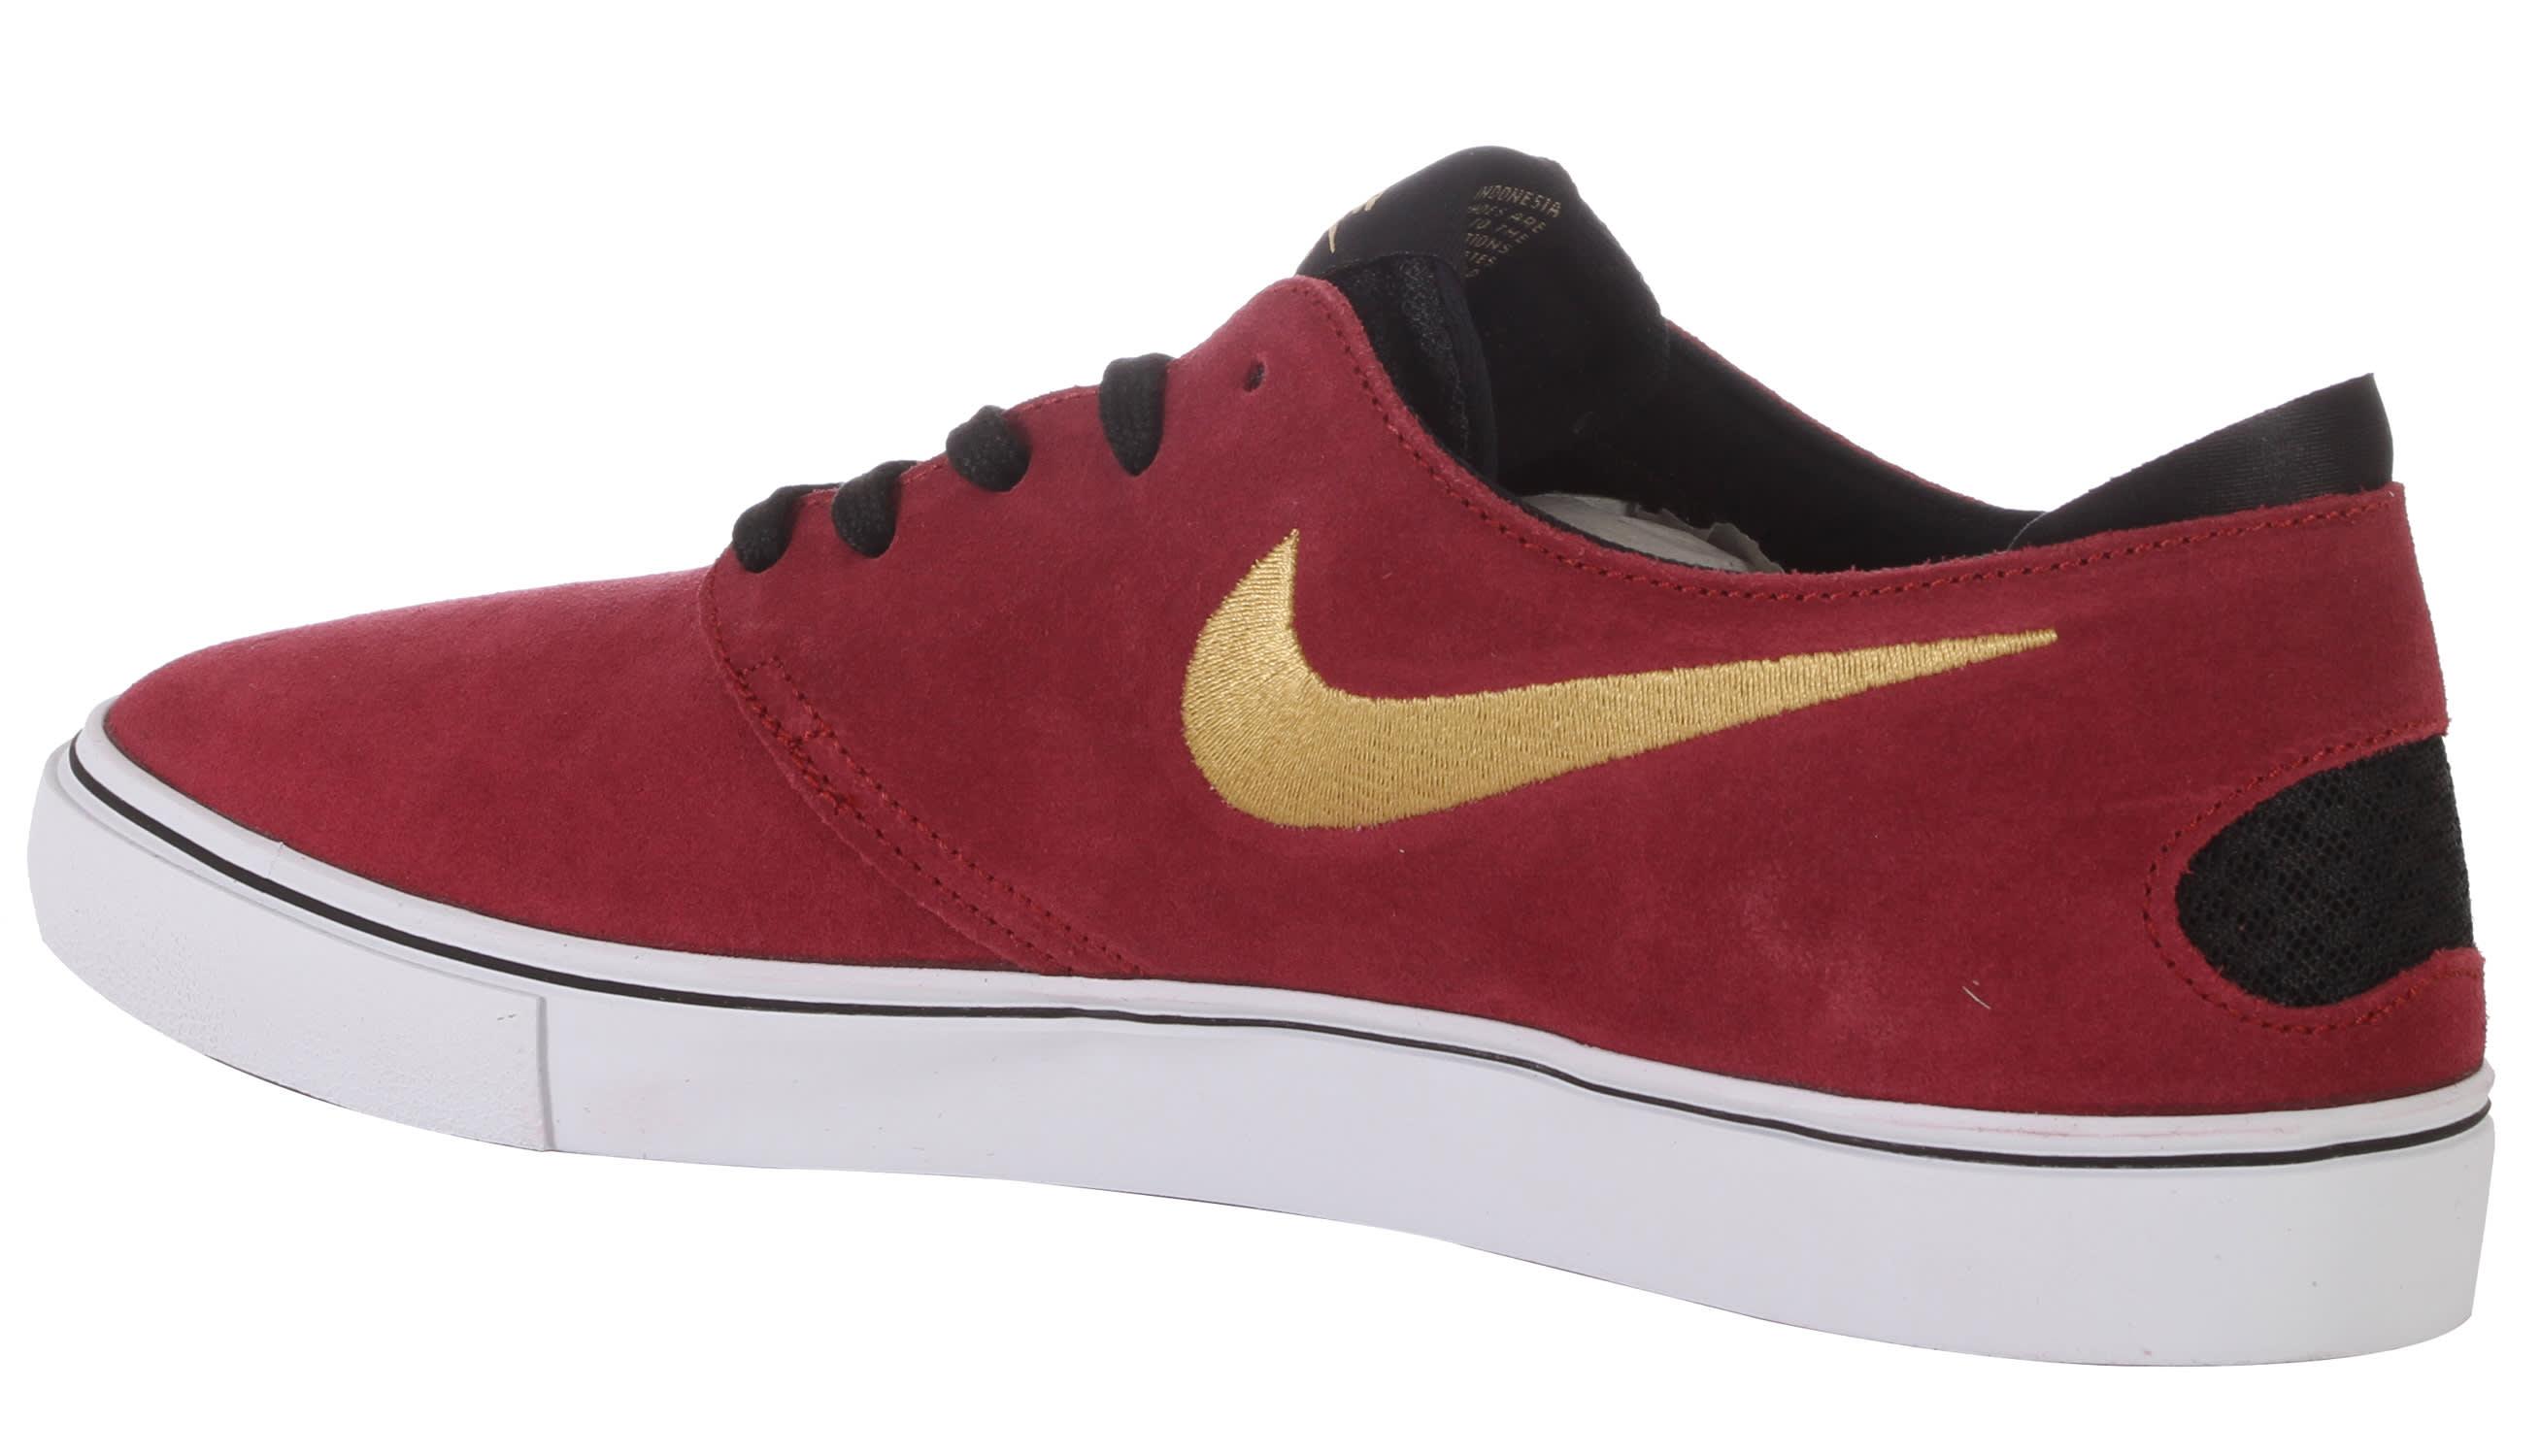 6490269f4026 Nike Zoom Oneshot SB Skate Shoes - thumbnail 3